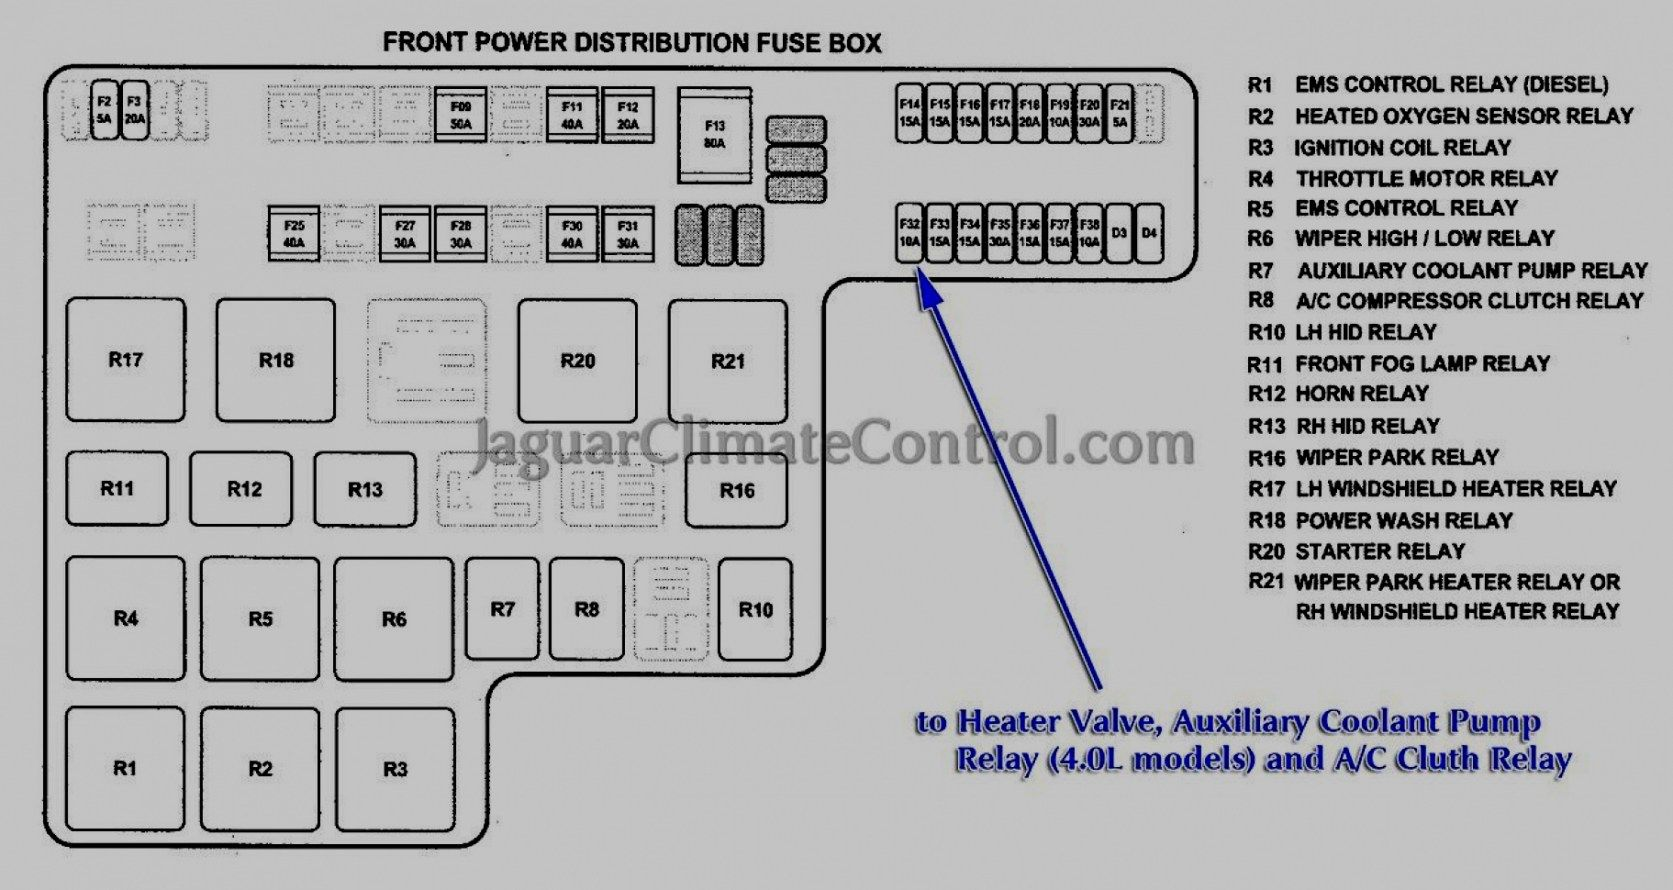 12s wiring diagram caravan 03 s type fuse box 1989 jaguar ... on